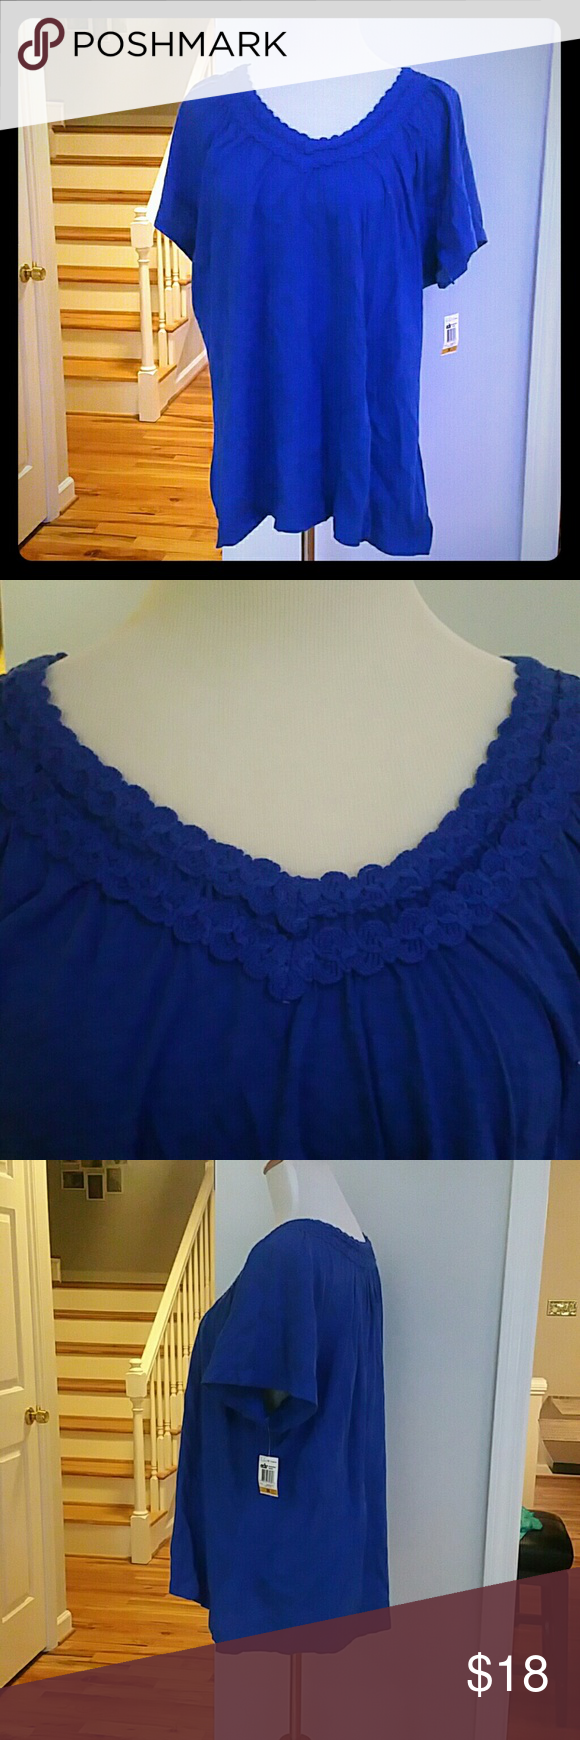 NWT JM COLLECTION PLUS SIZE TOP NWT JM Collection Plus Size Short-Sleeve Crochet-Trim Top  Color : Deep Pacific  Size : 3X  Materials : 100% COTTON JM Collection  Tops Tees - Short Sleeve